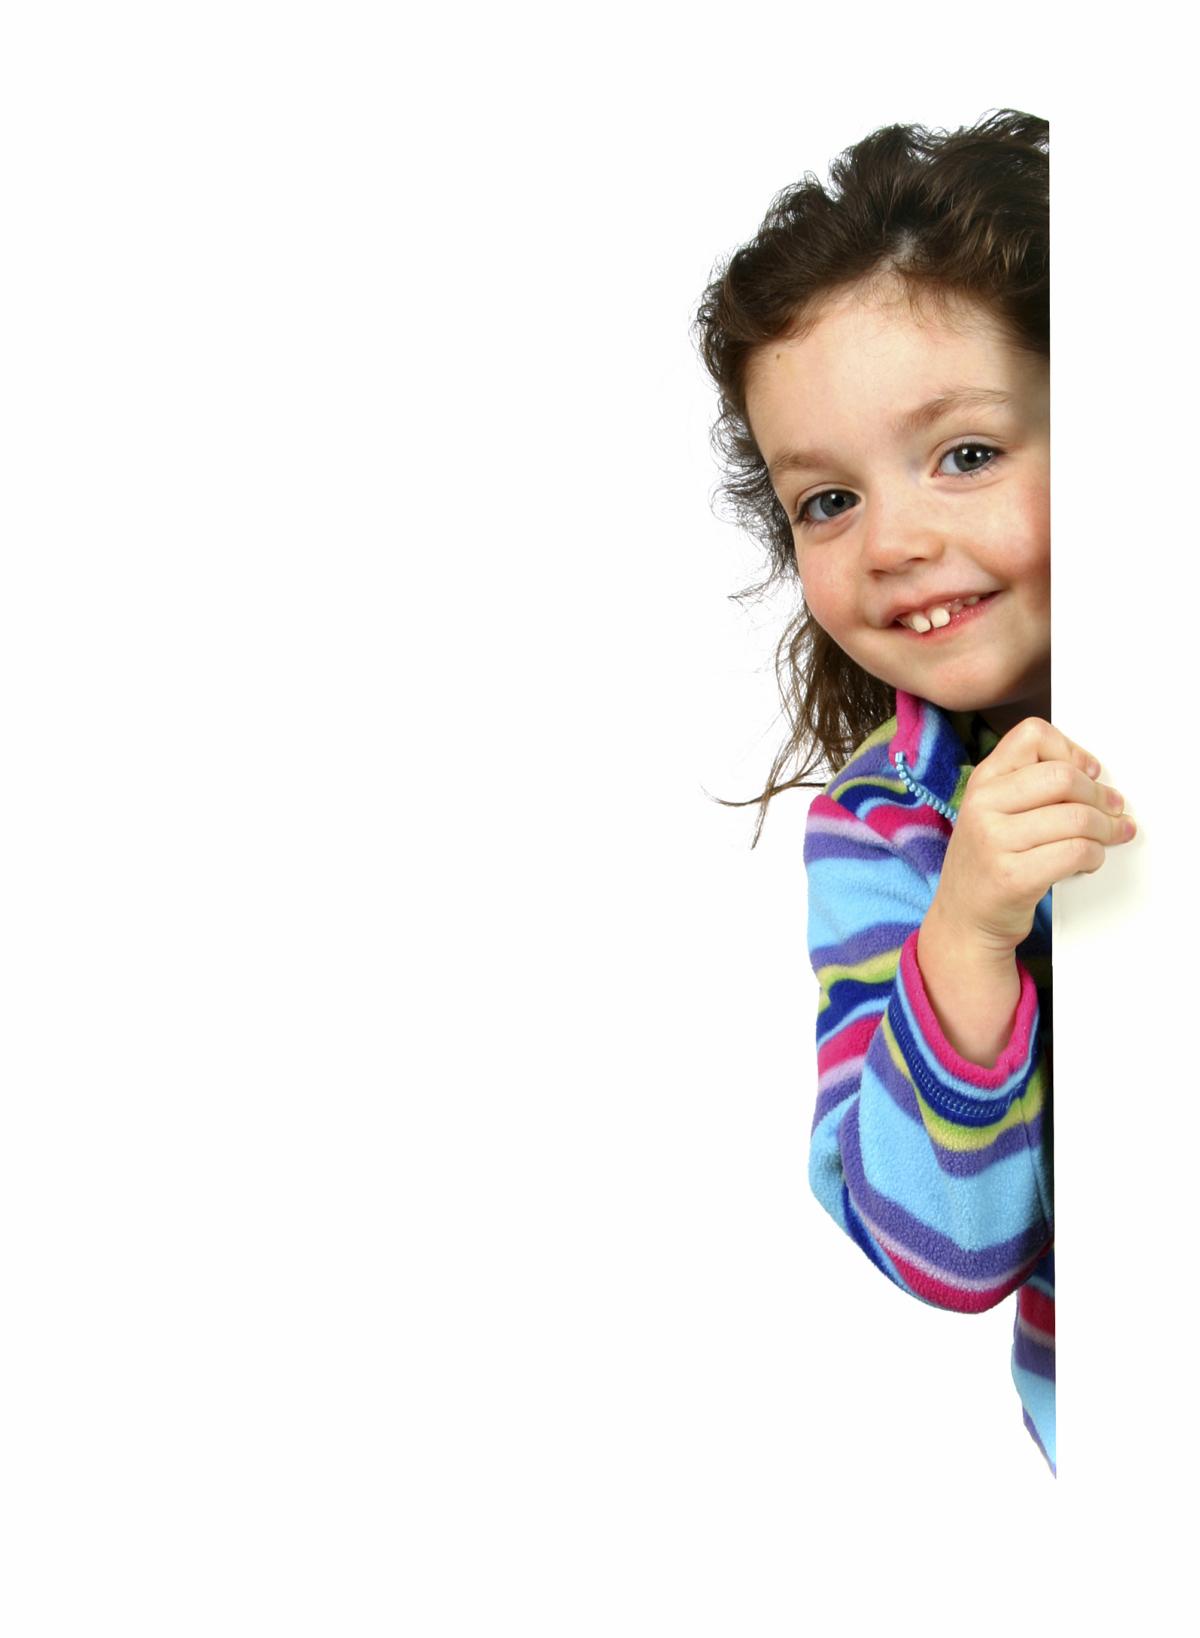 Children Dentist and Pediatric Dentistry Service